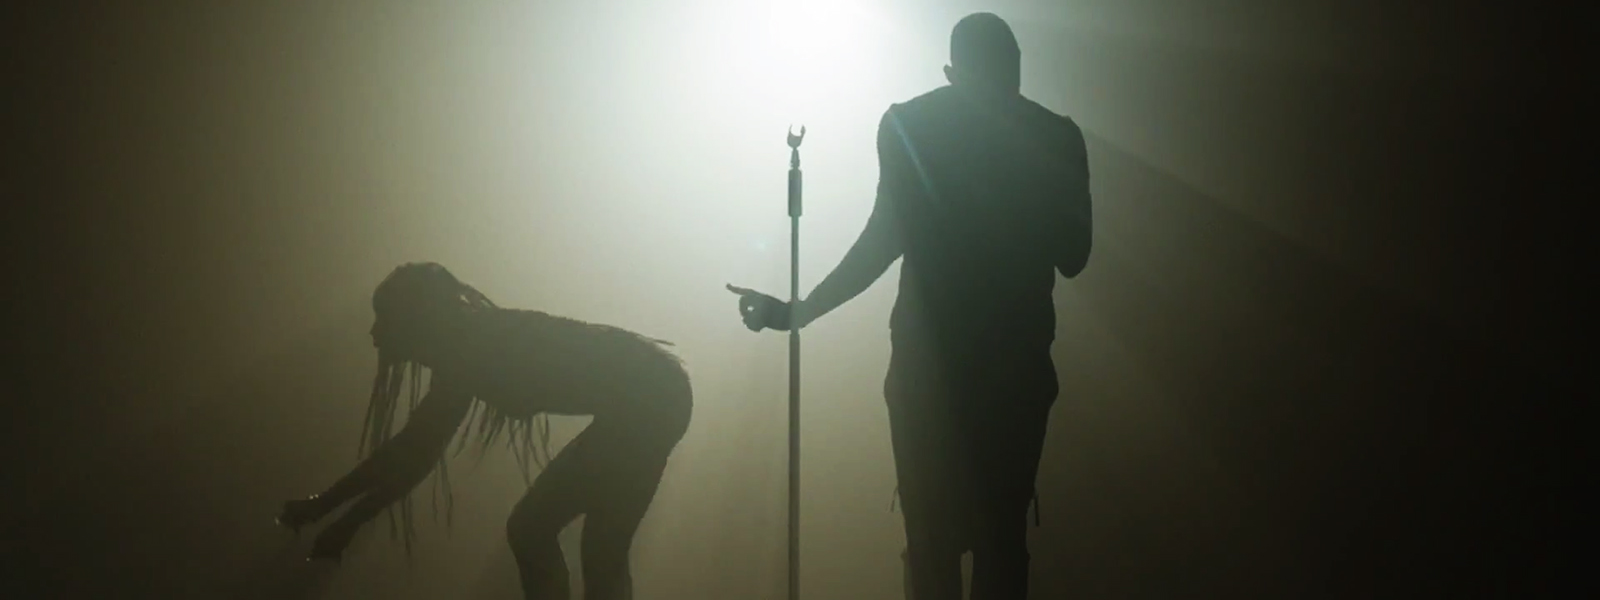 Usher – She Came To Give It To You ft. Nicki Minaj